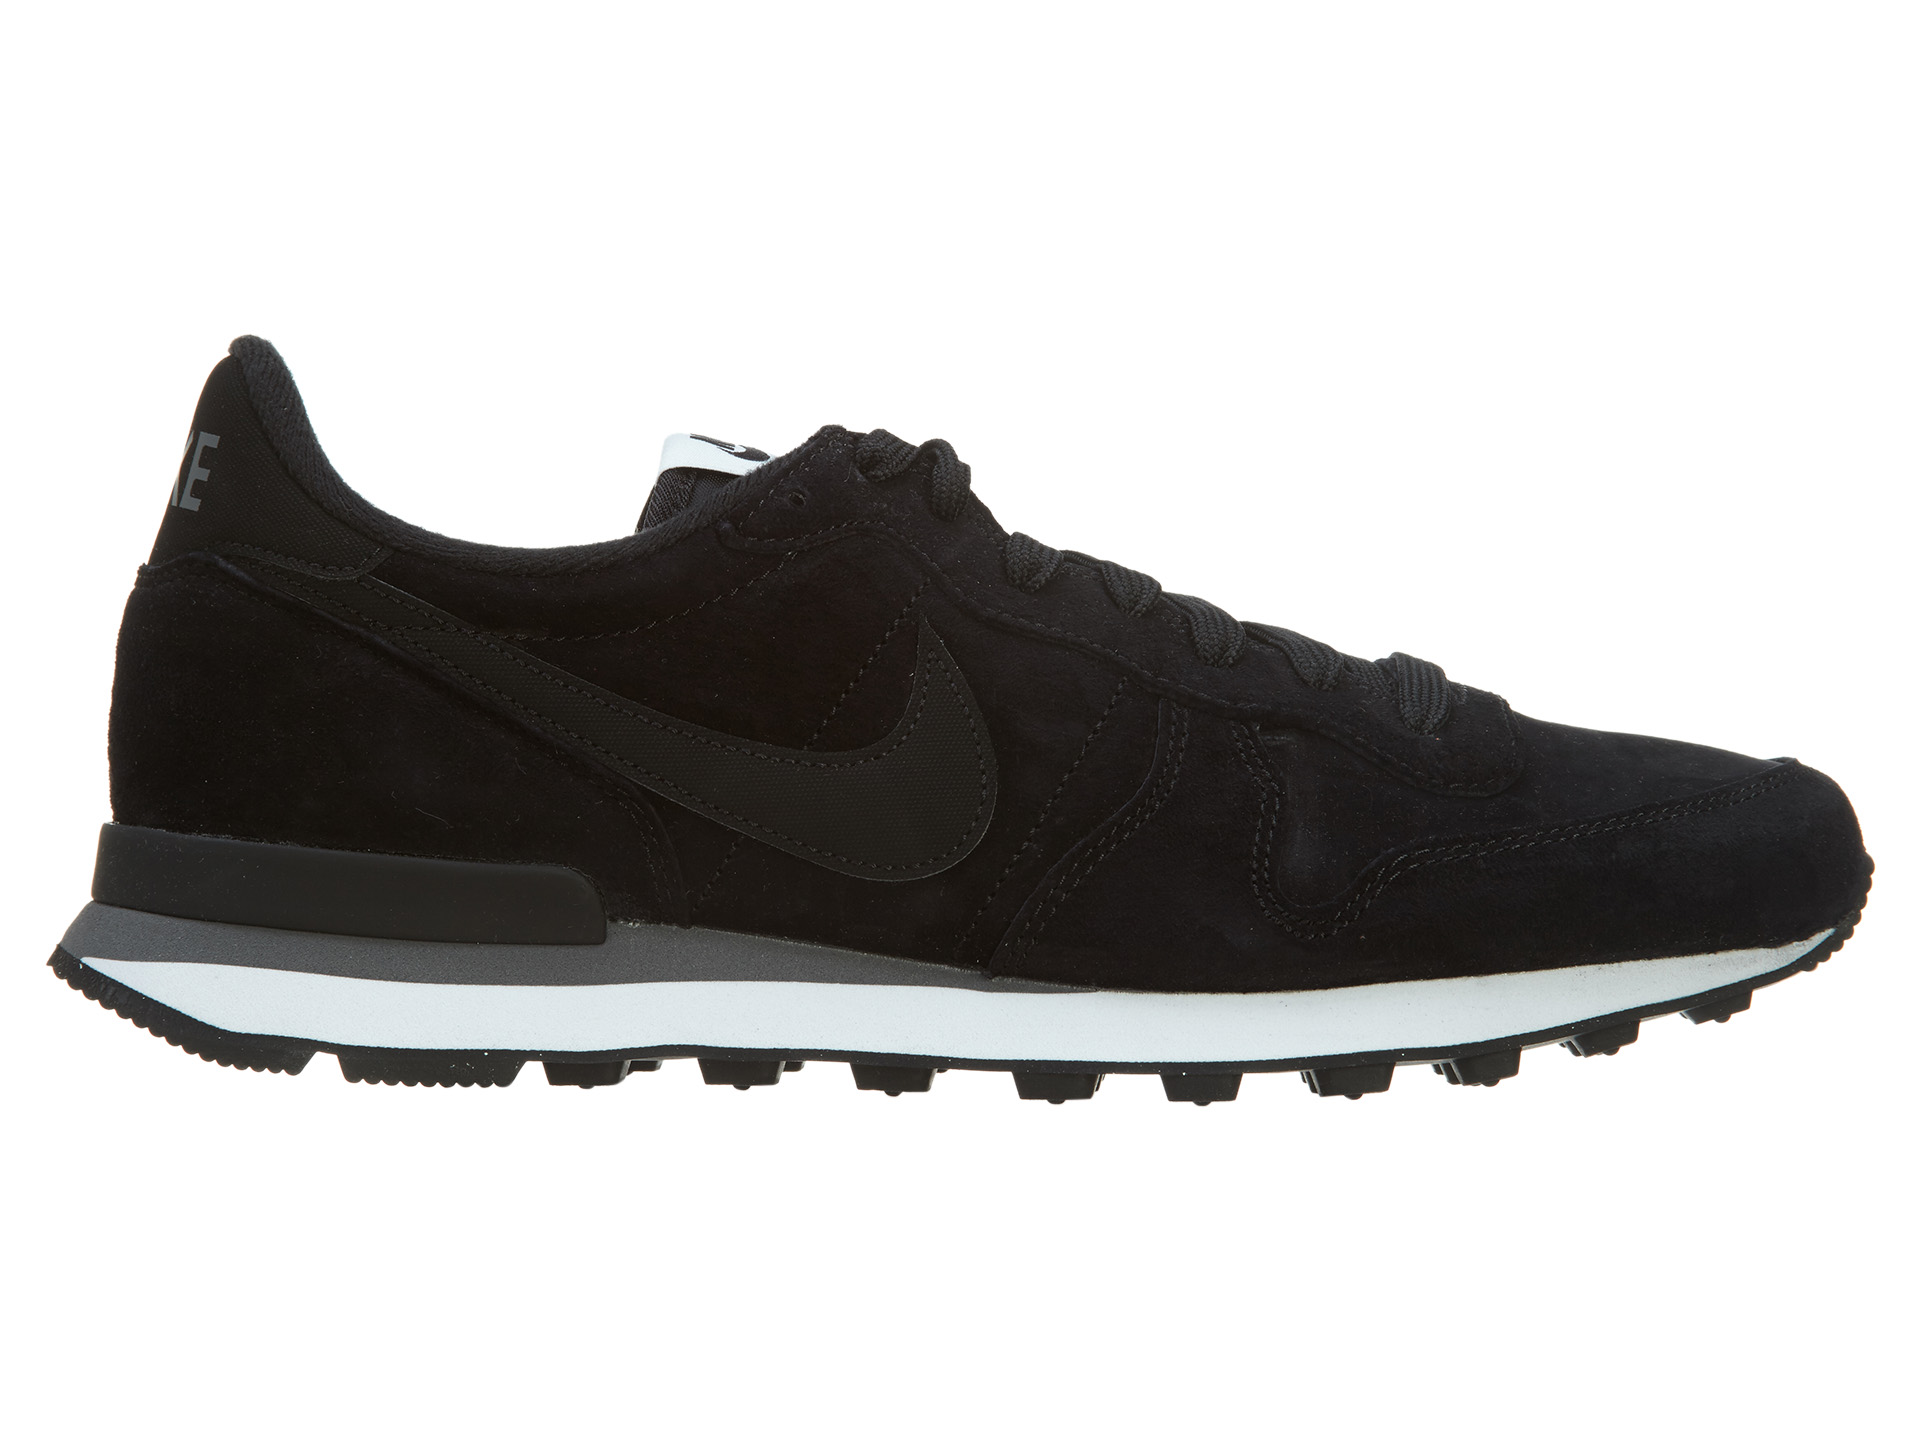 Nike Internationalist Leather Black Black-Dark Grey-White - 631755-010